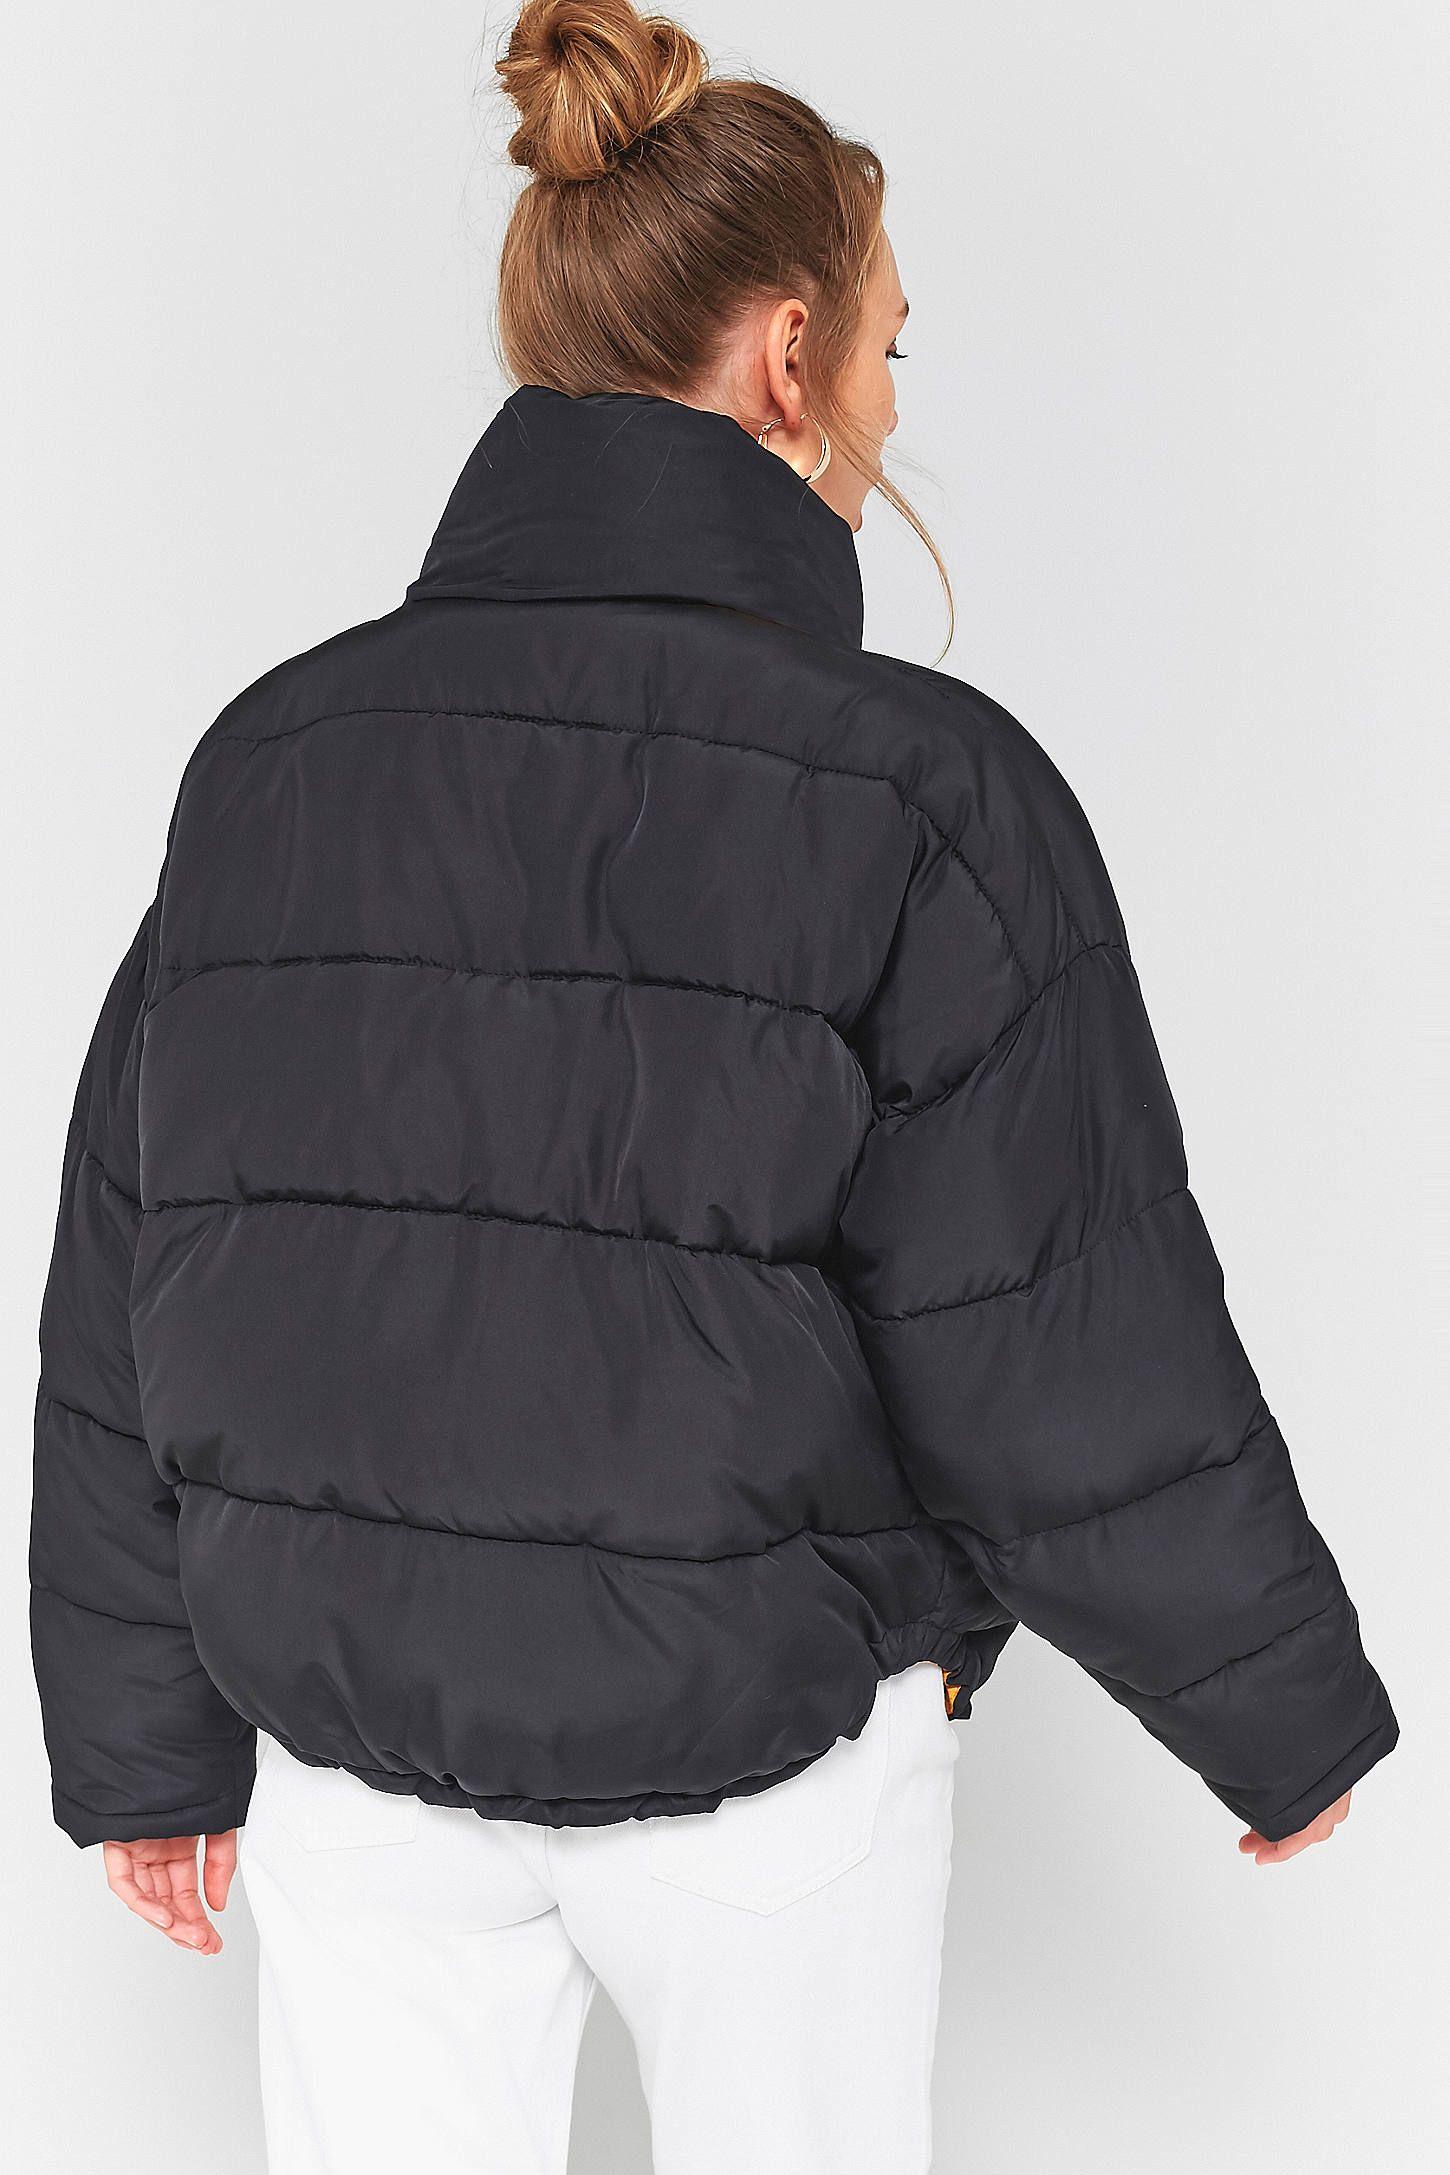 Light Before Dark Black Yellow Contrast Lining Pillow Puffer Jacket Jackets Puffer Jackets Black N Yellow [ 2175 x 1450 Pixel ]